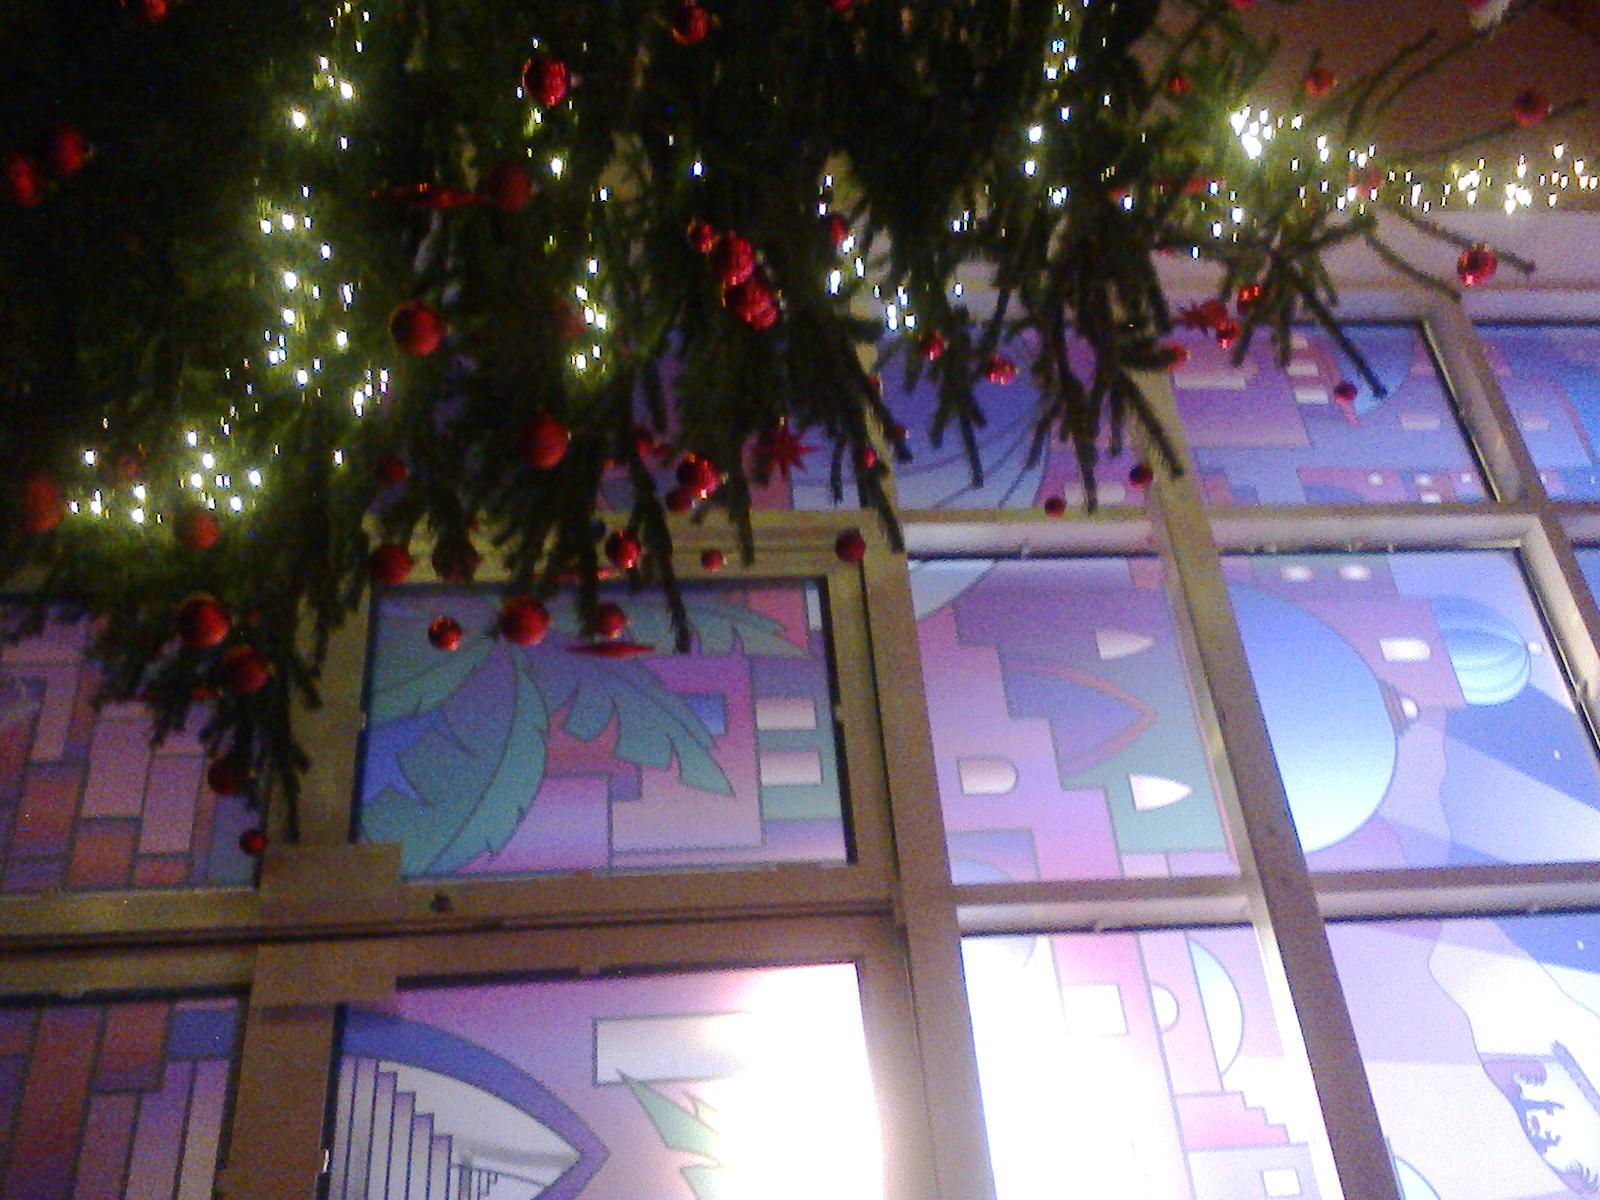 Christmas time for joy time for mourning sc skillman blog for 12 joy terrace malden ma